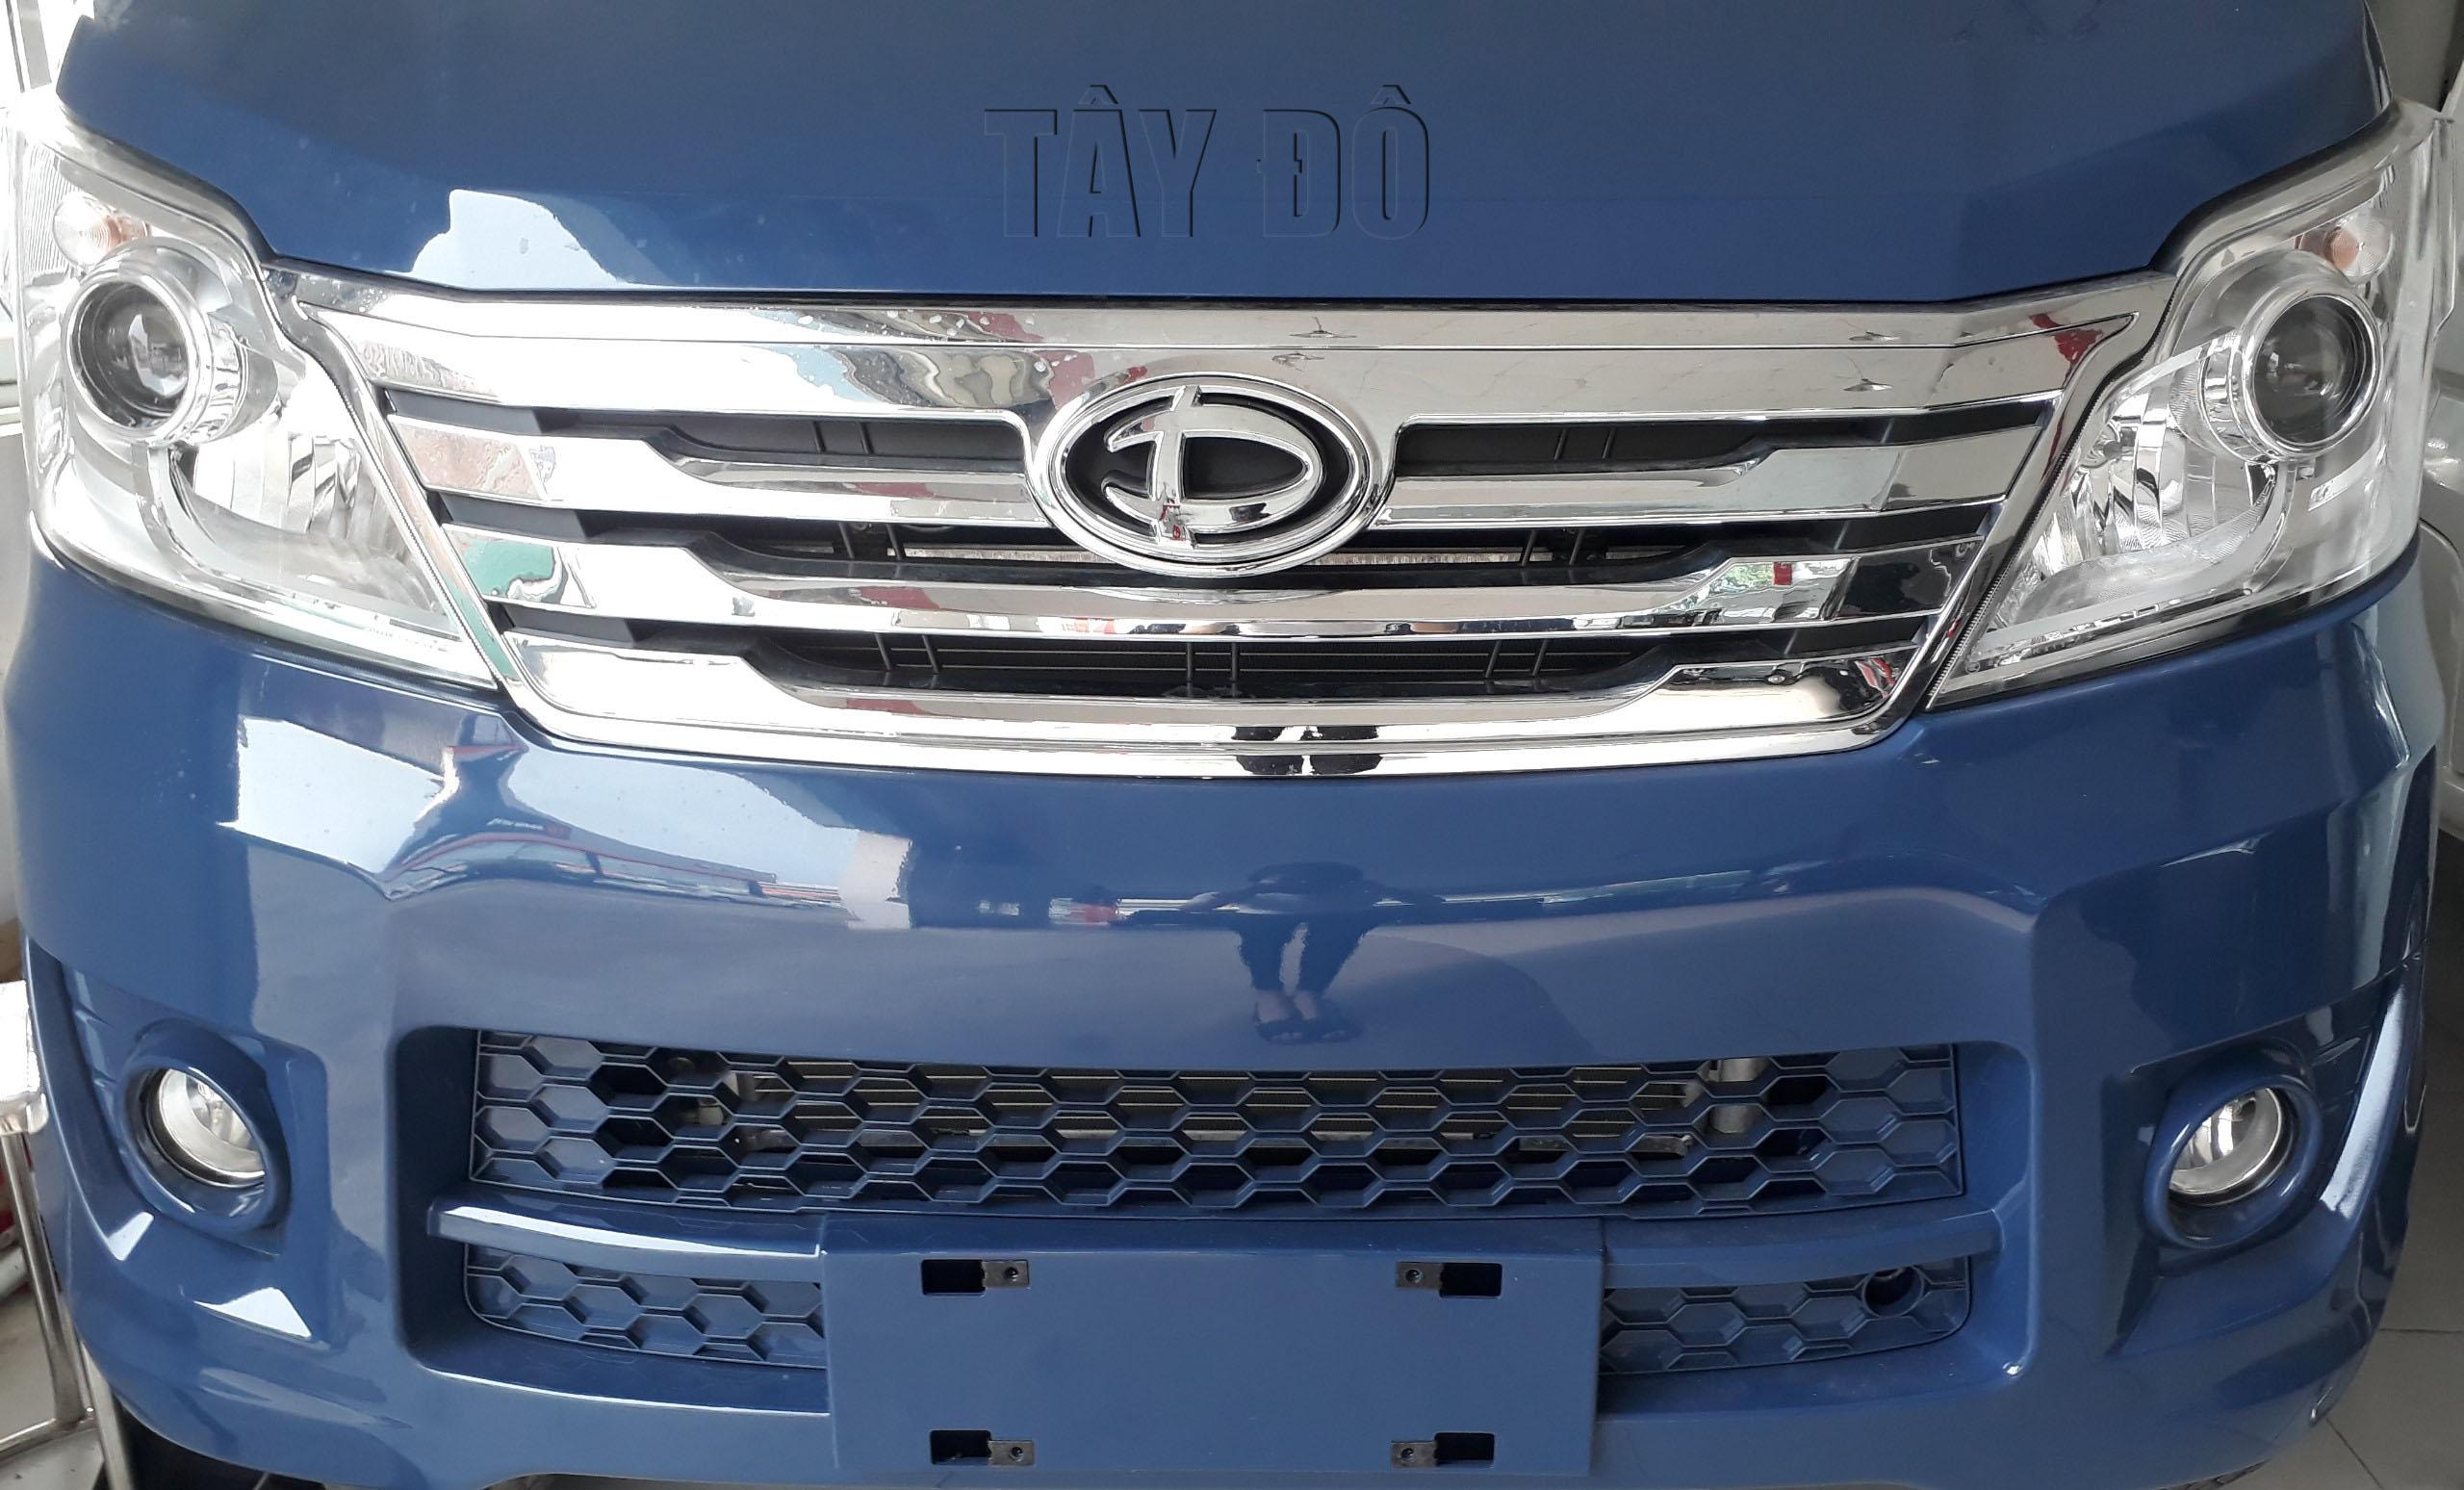 mat-na-ca-lang-xe-tai-990-kg-tera100